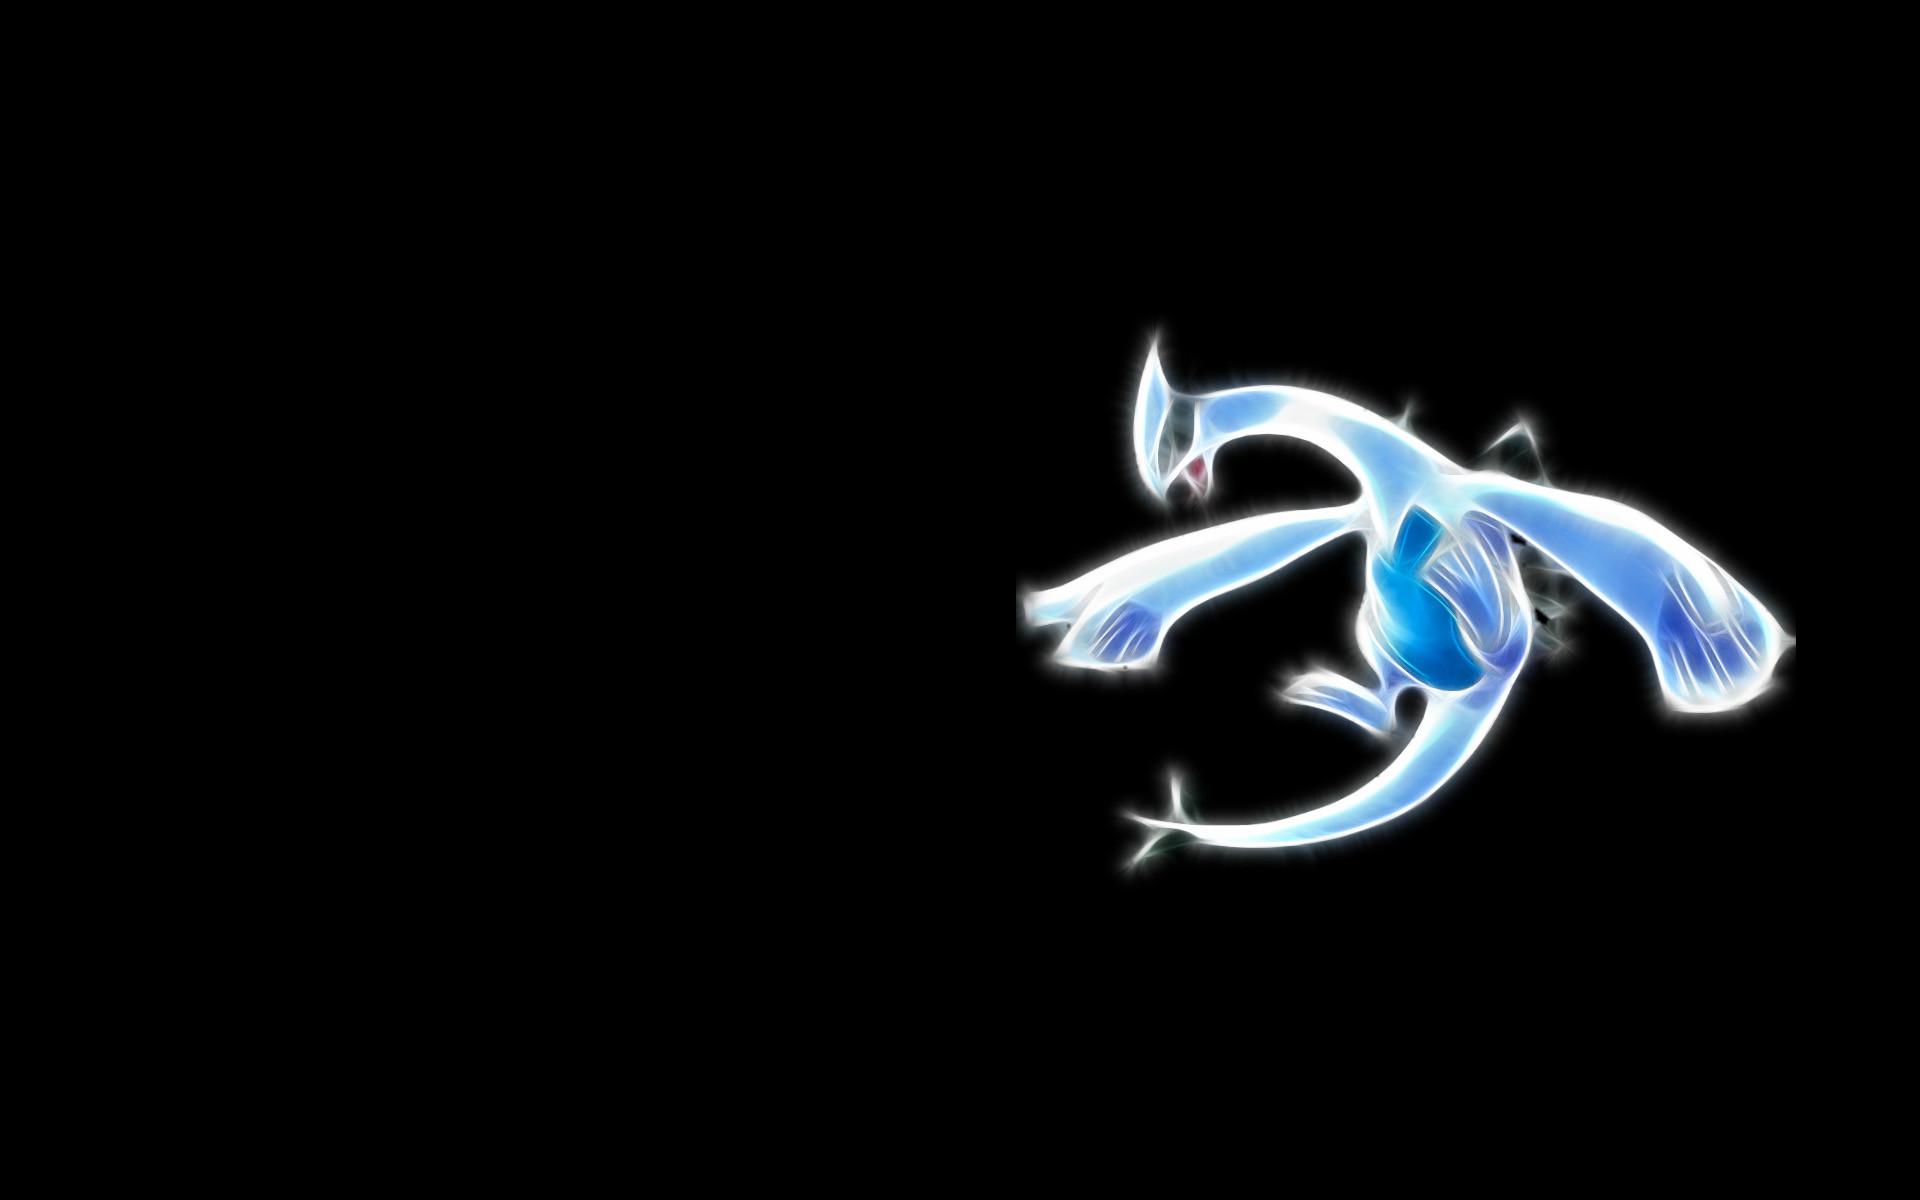 pokemon lugia black entertainment desktop wallpaper download pokemon .